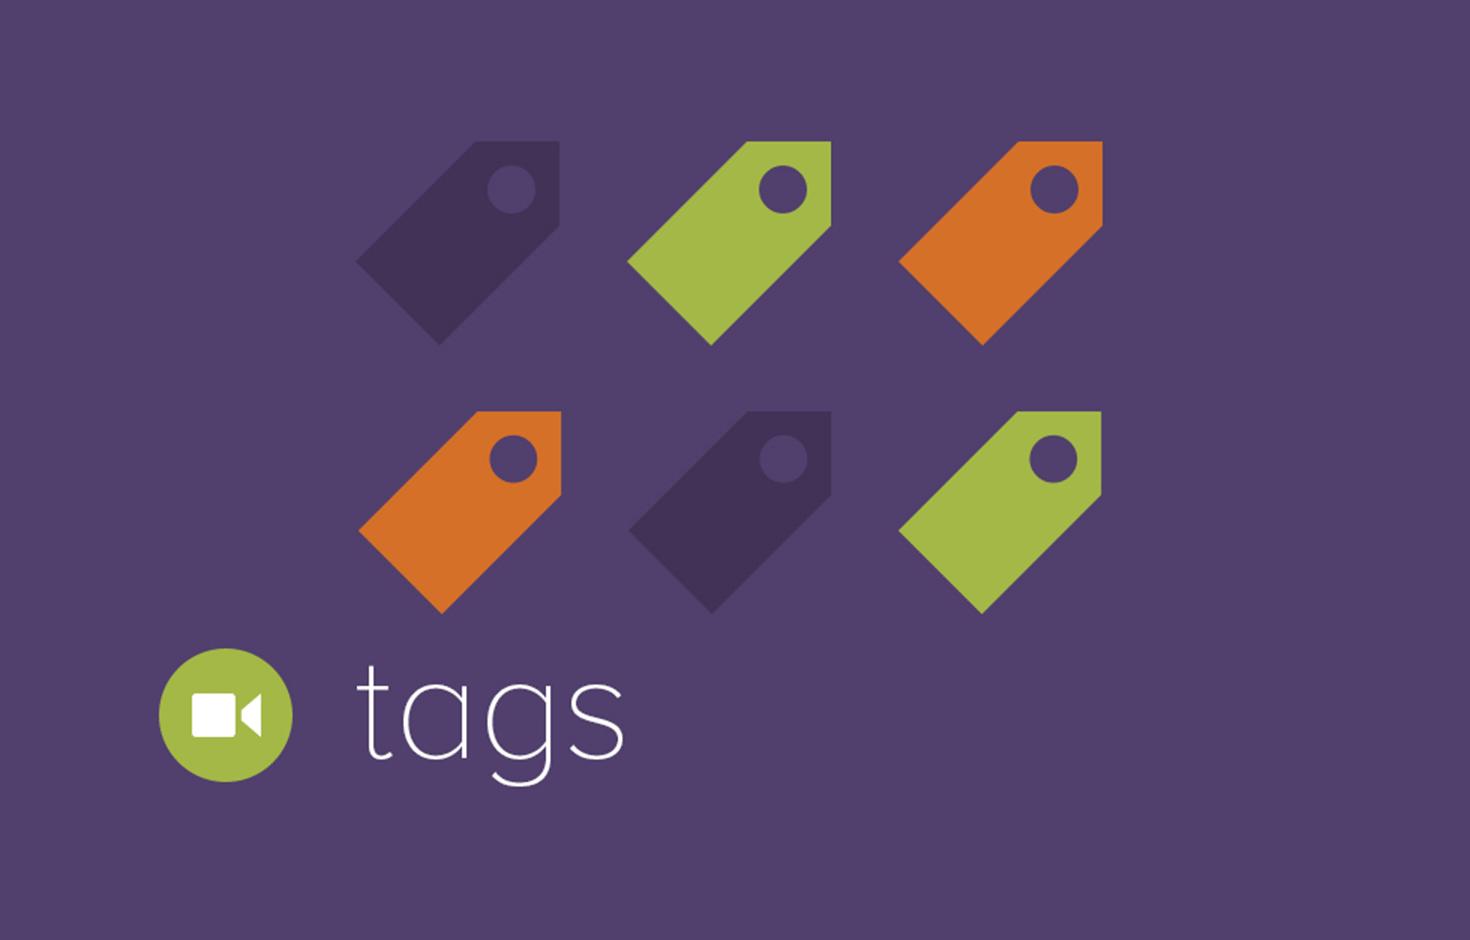 tags-thumb-1470x940